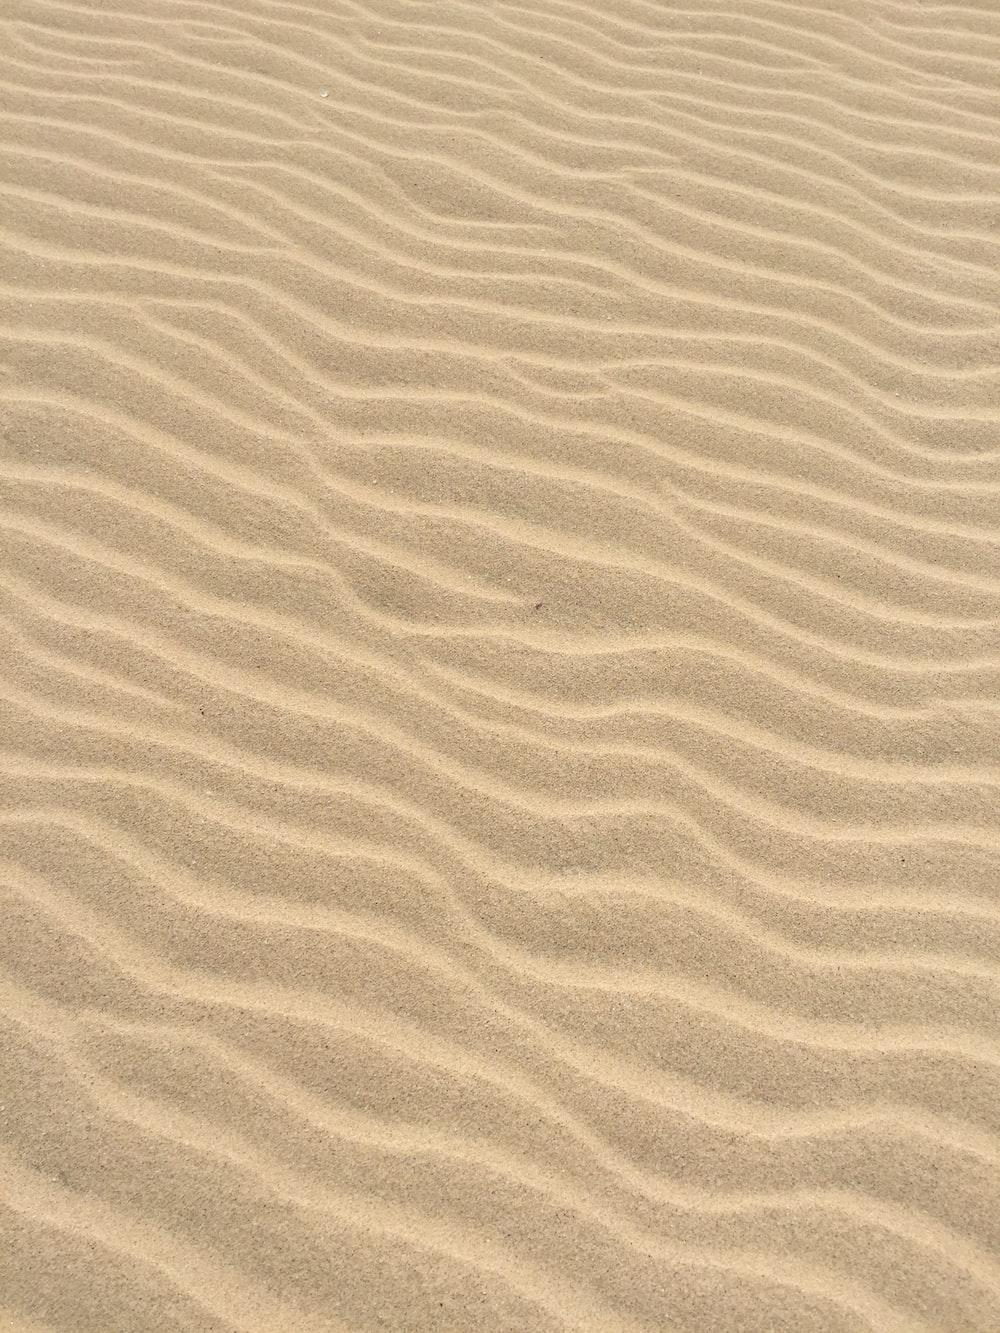 brown sands